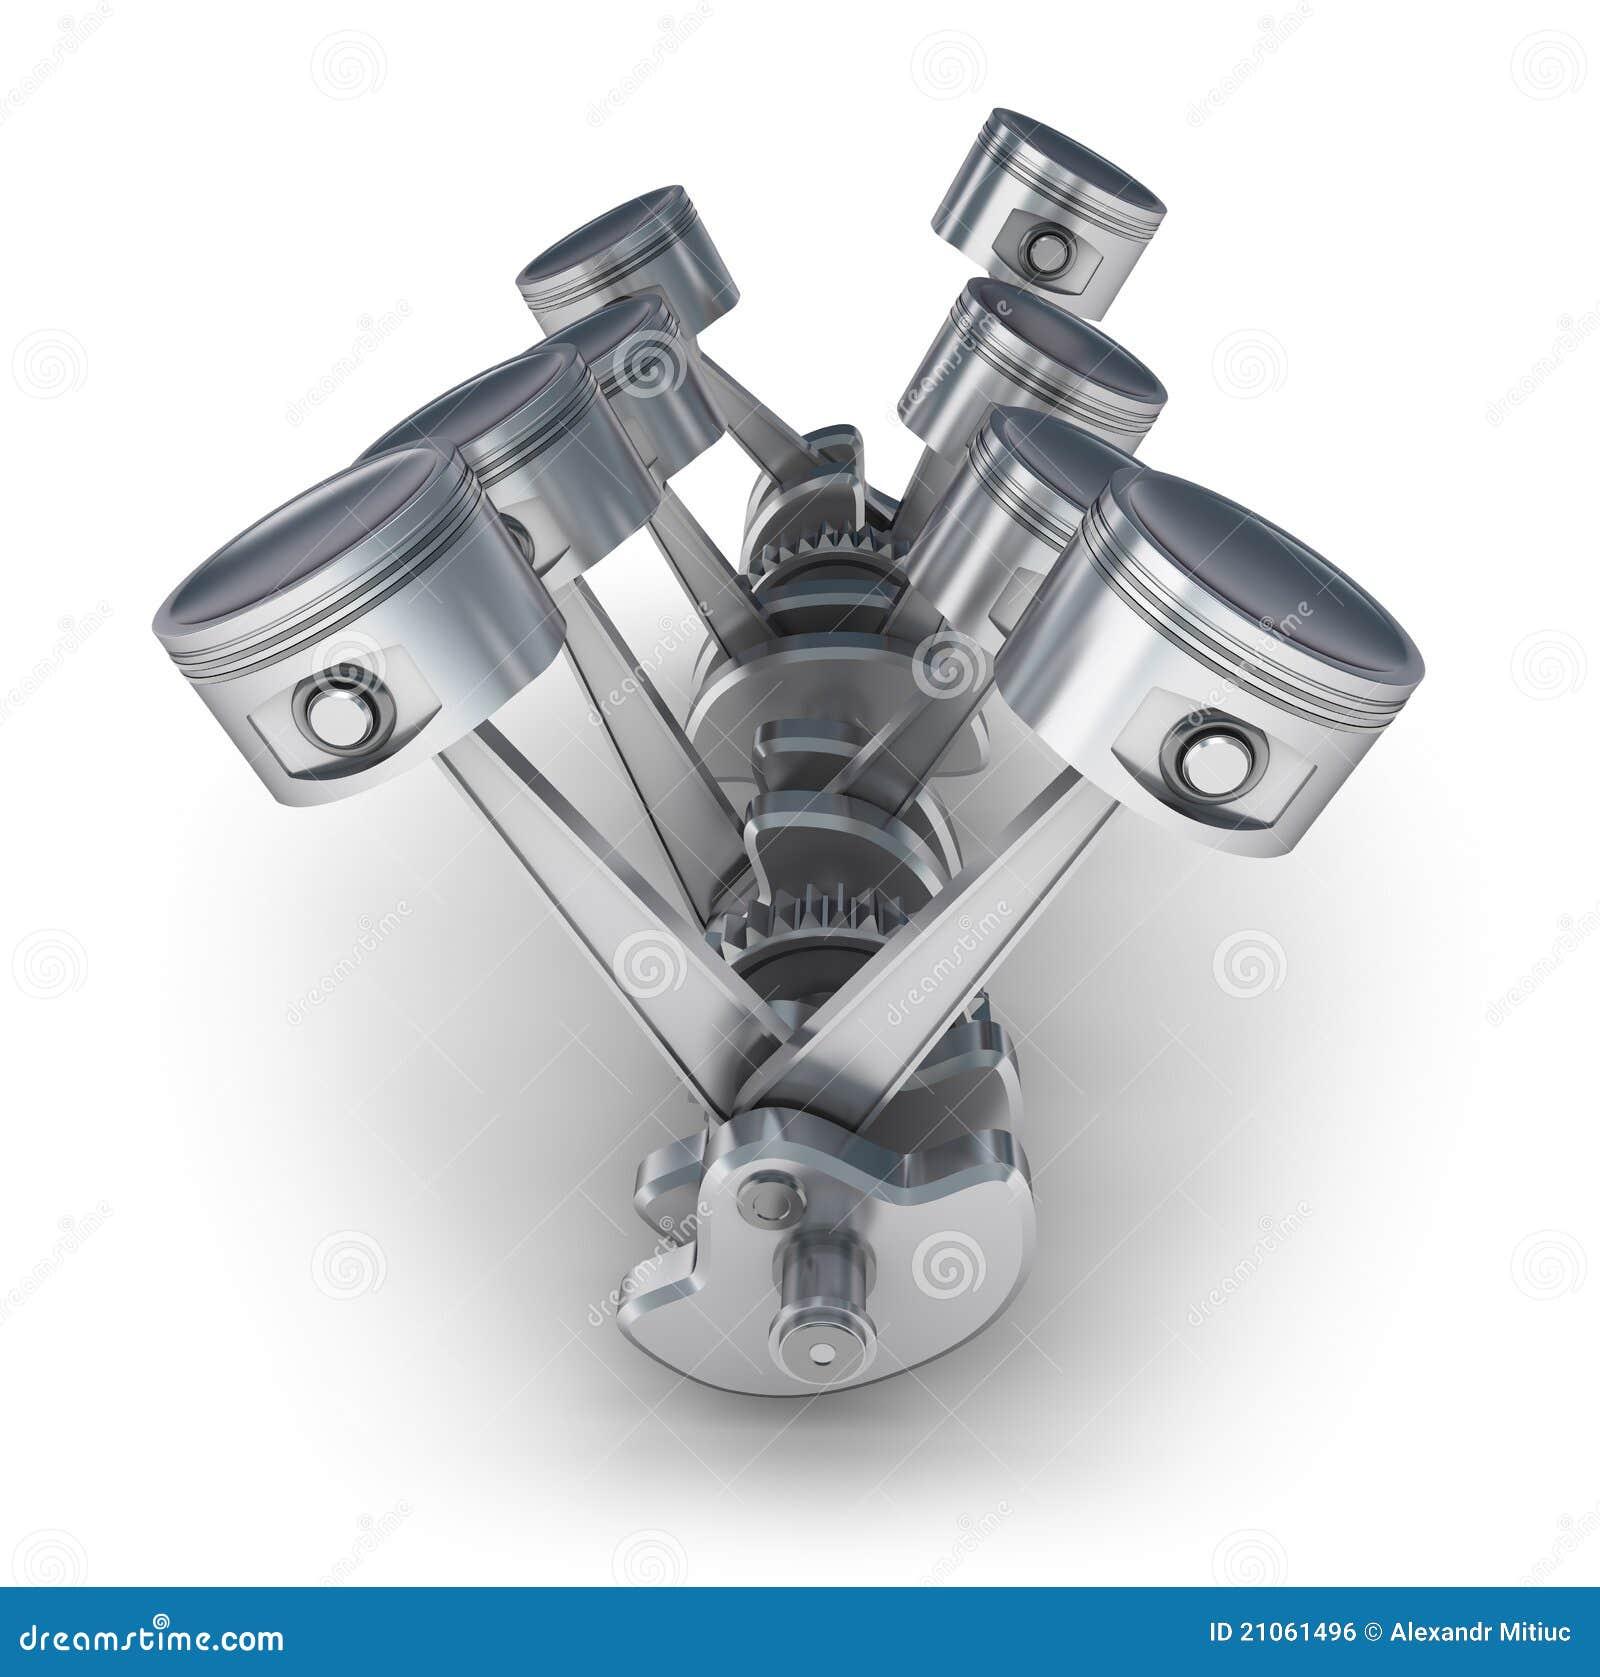 V8 engine pistons royalty free stock image image 21061496 for Sell em all motors